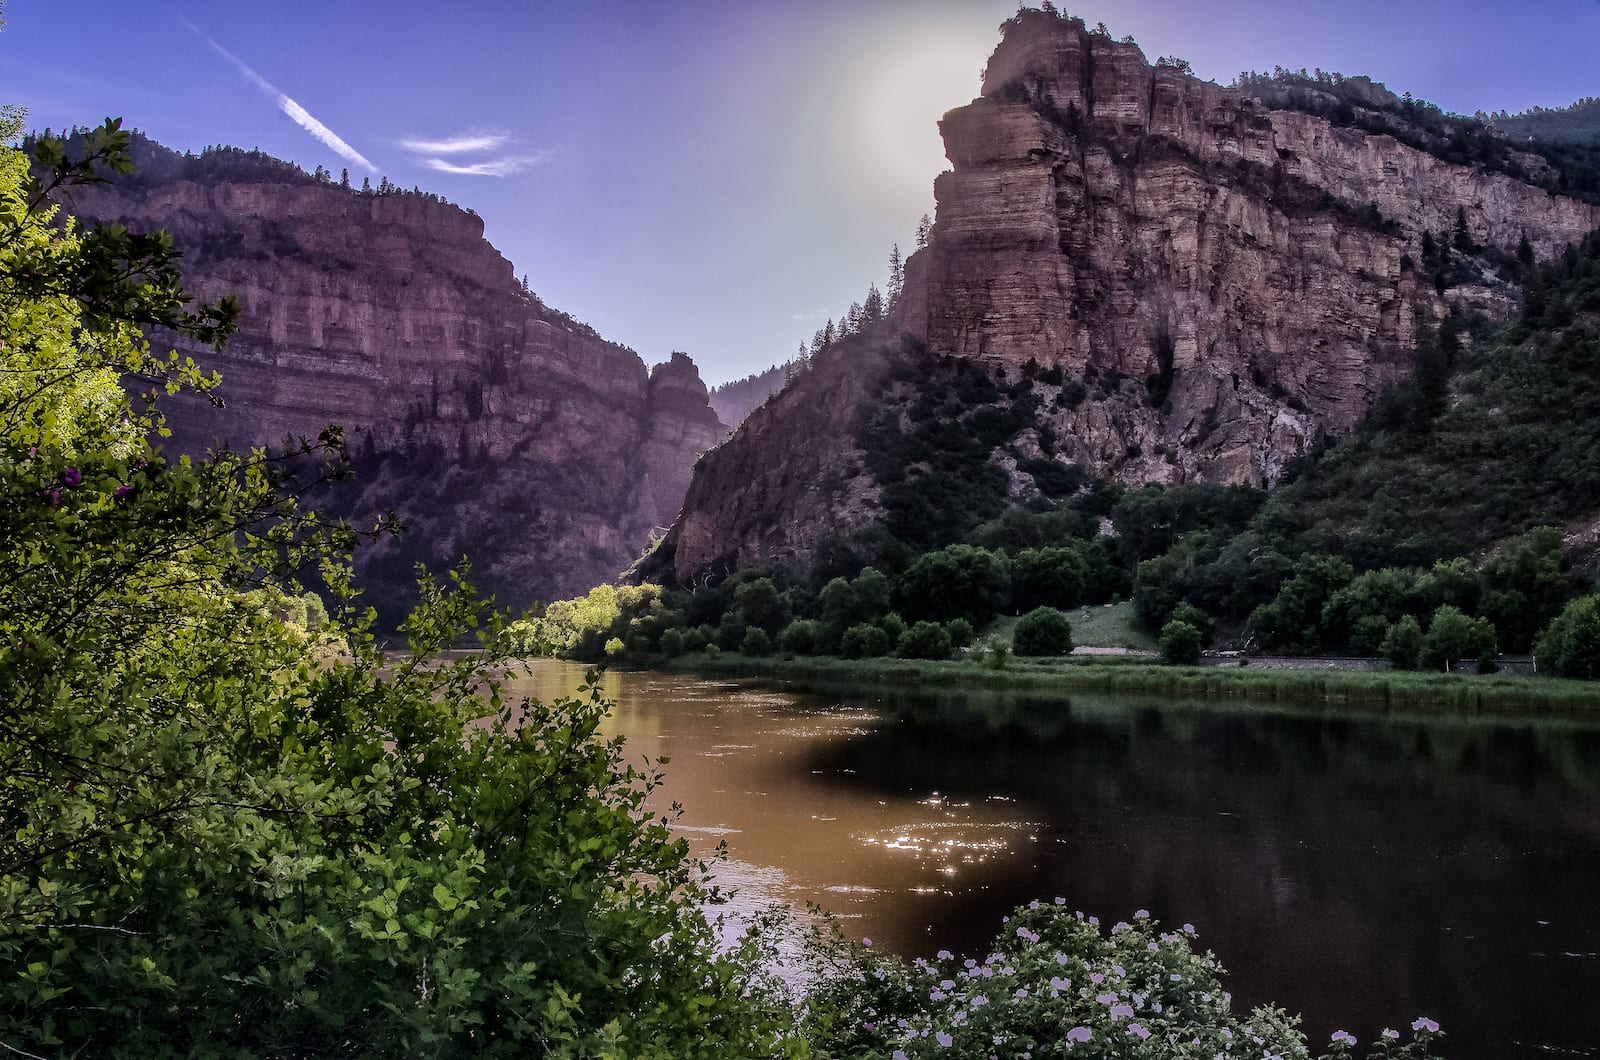 Colorado River near hanging lake entrance, CO